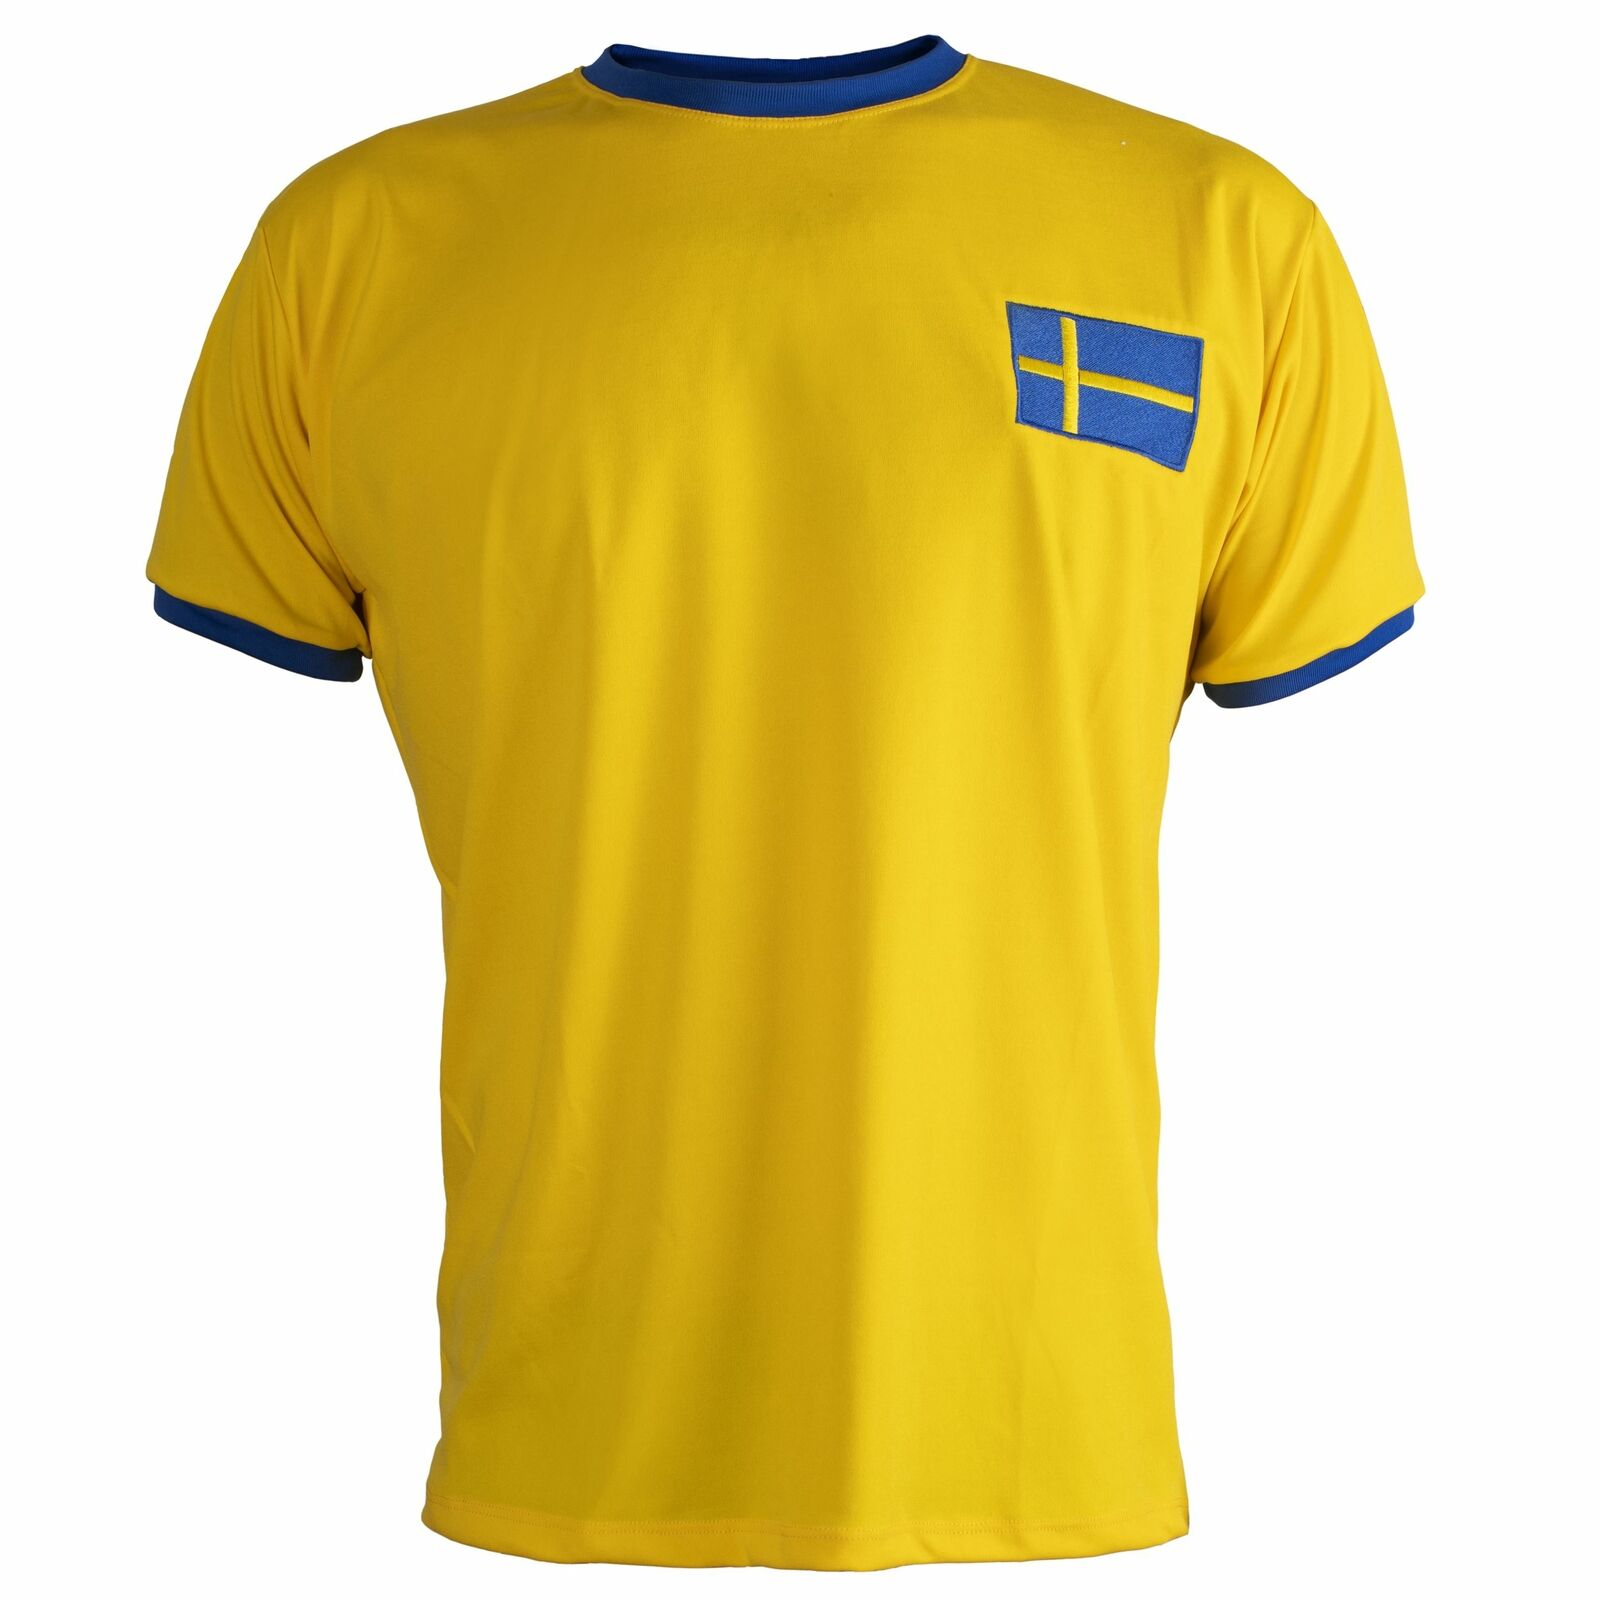 Schweden   Sverige Hemd Hemd Hemd Retro Fußball Kurzärmelig Herren Top b8937a